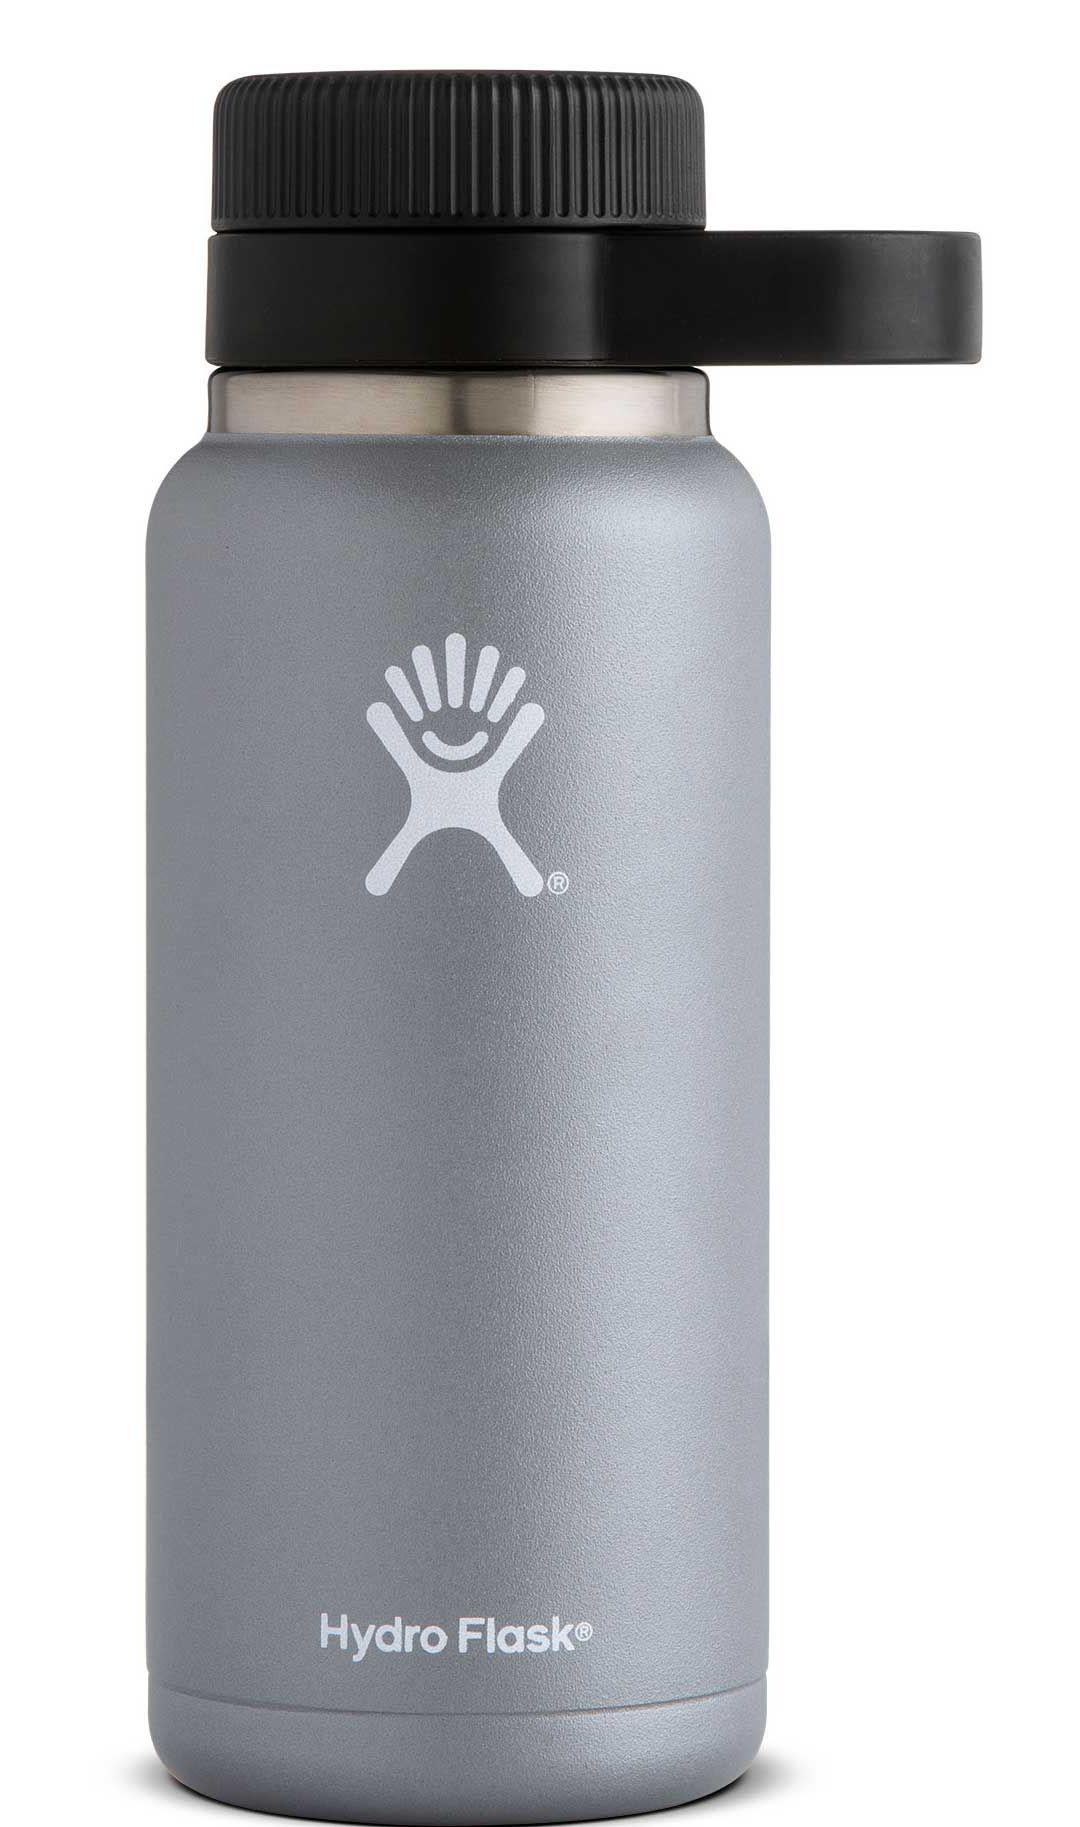 62acfab05b Hydro Flask 32 oz Growler | DICK'S Sporting Goods